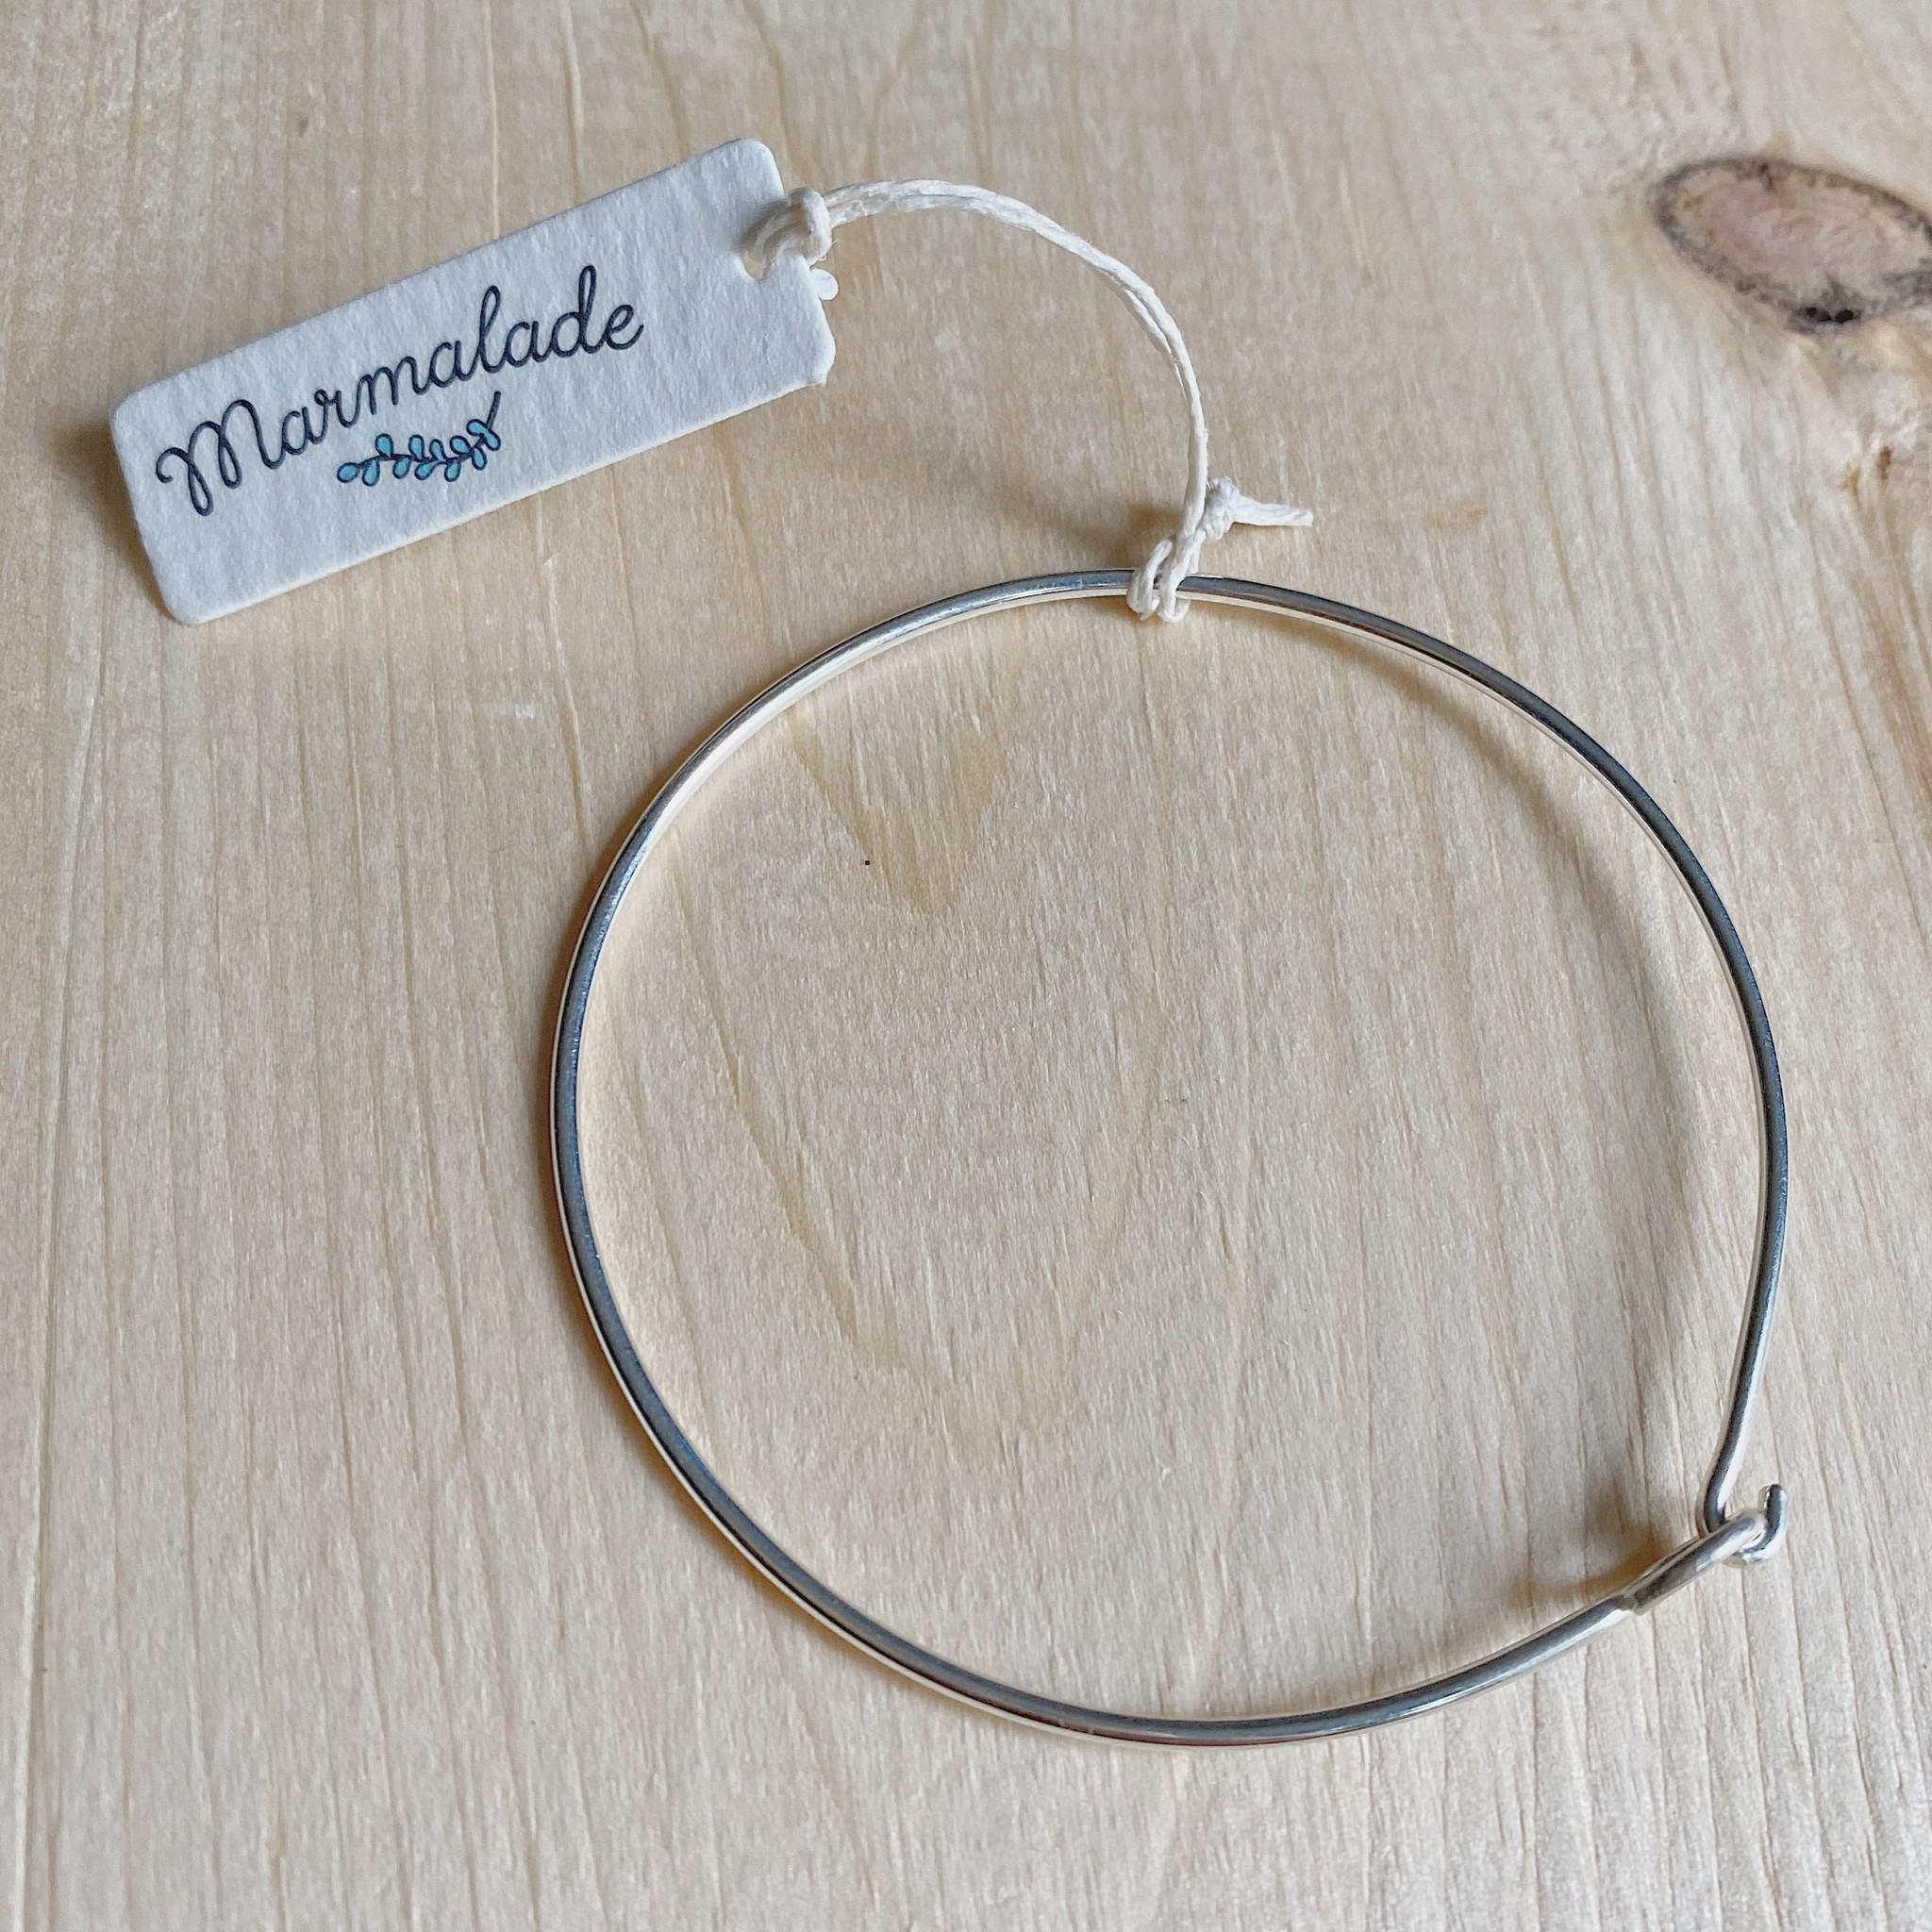 Marmalade Silver Hook Bangle